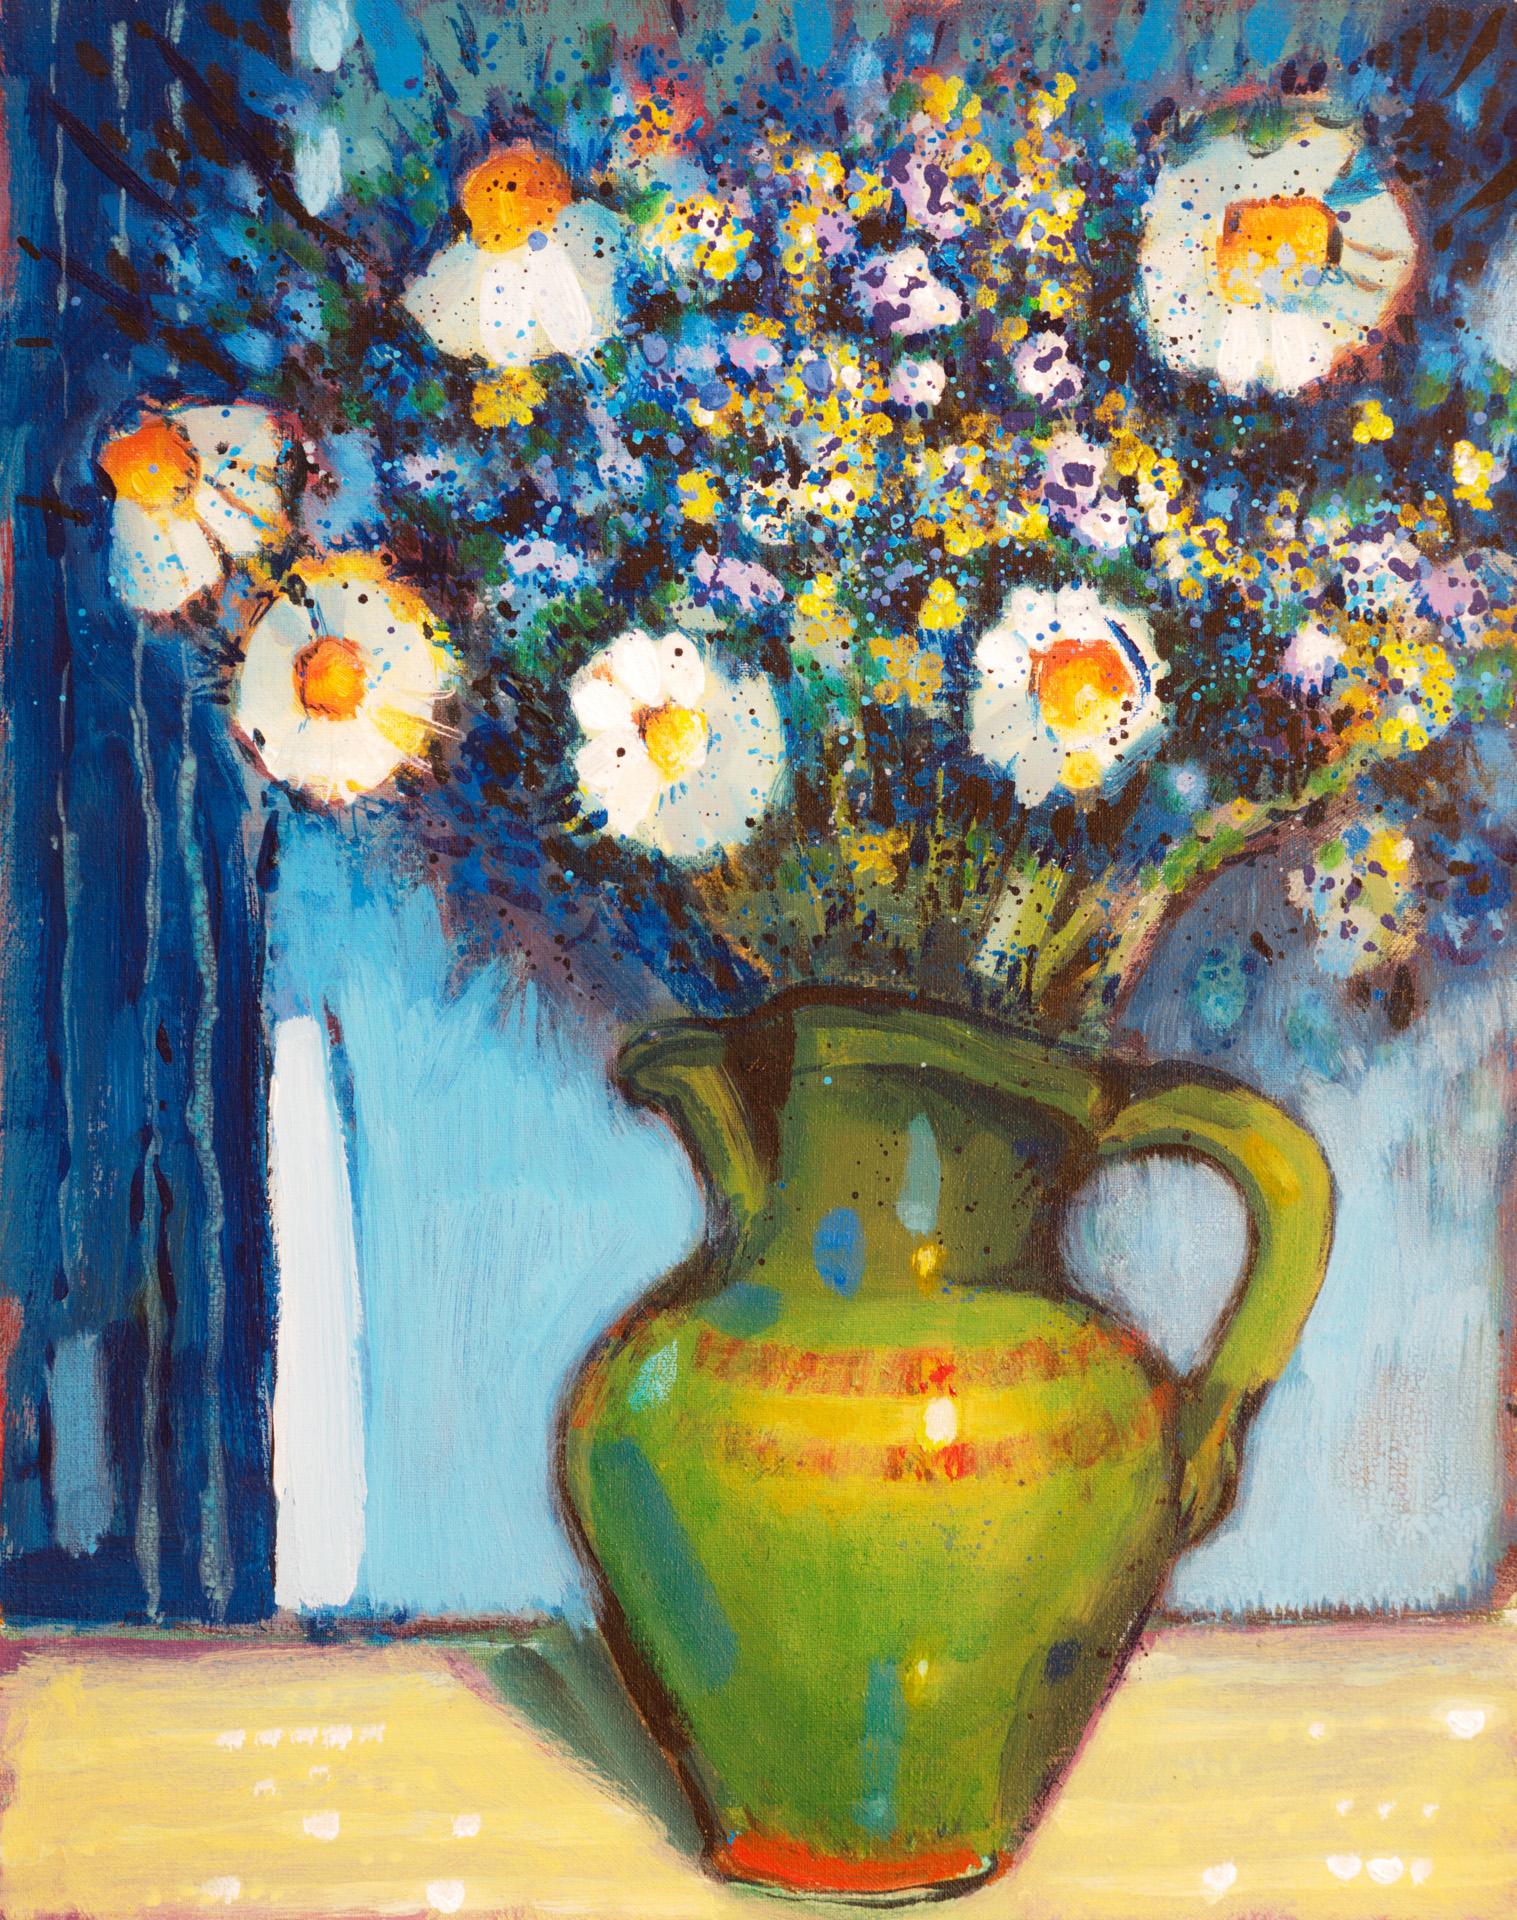 Still Life X / 2000 / oil on canvas / 40x50 cm